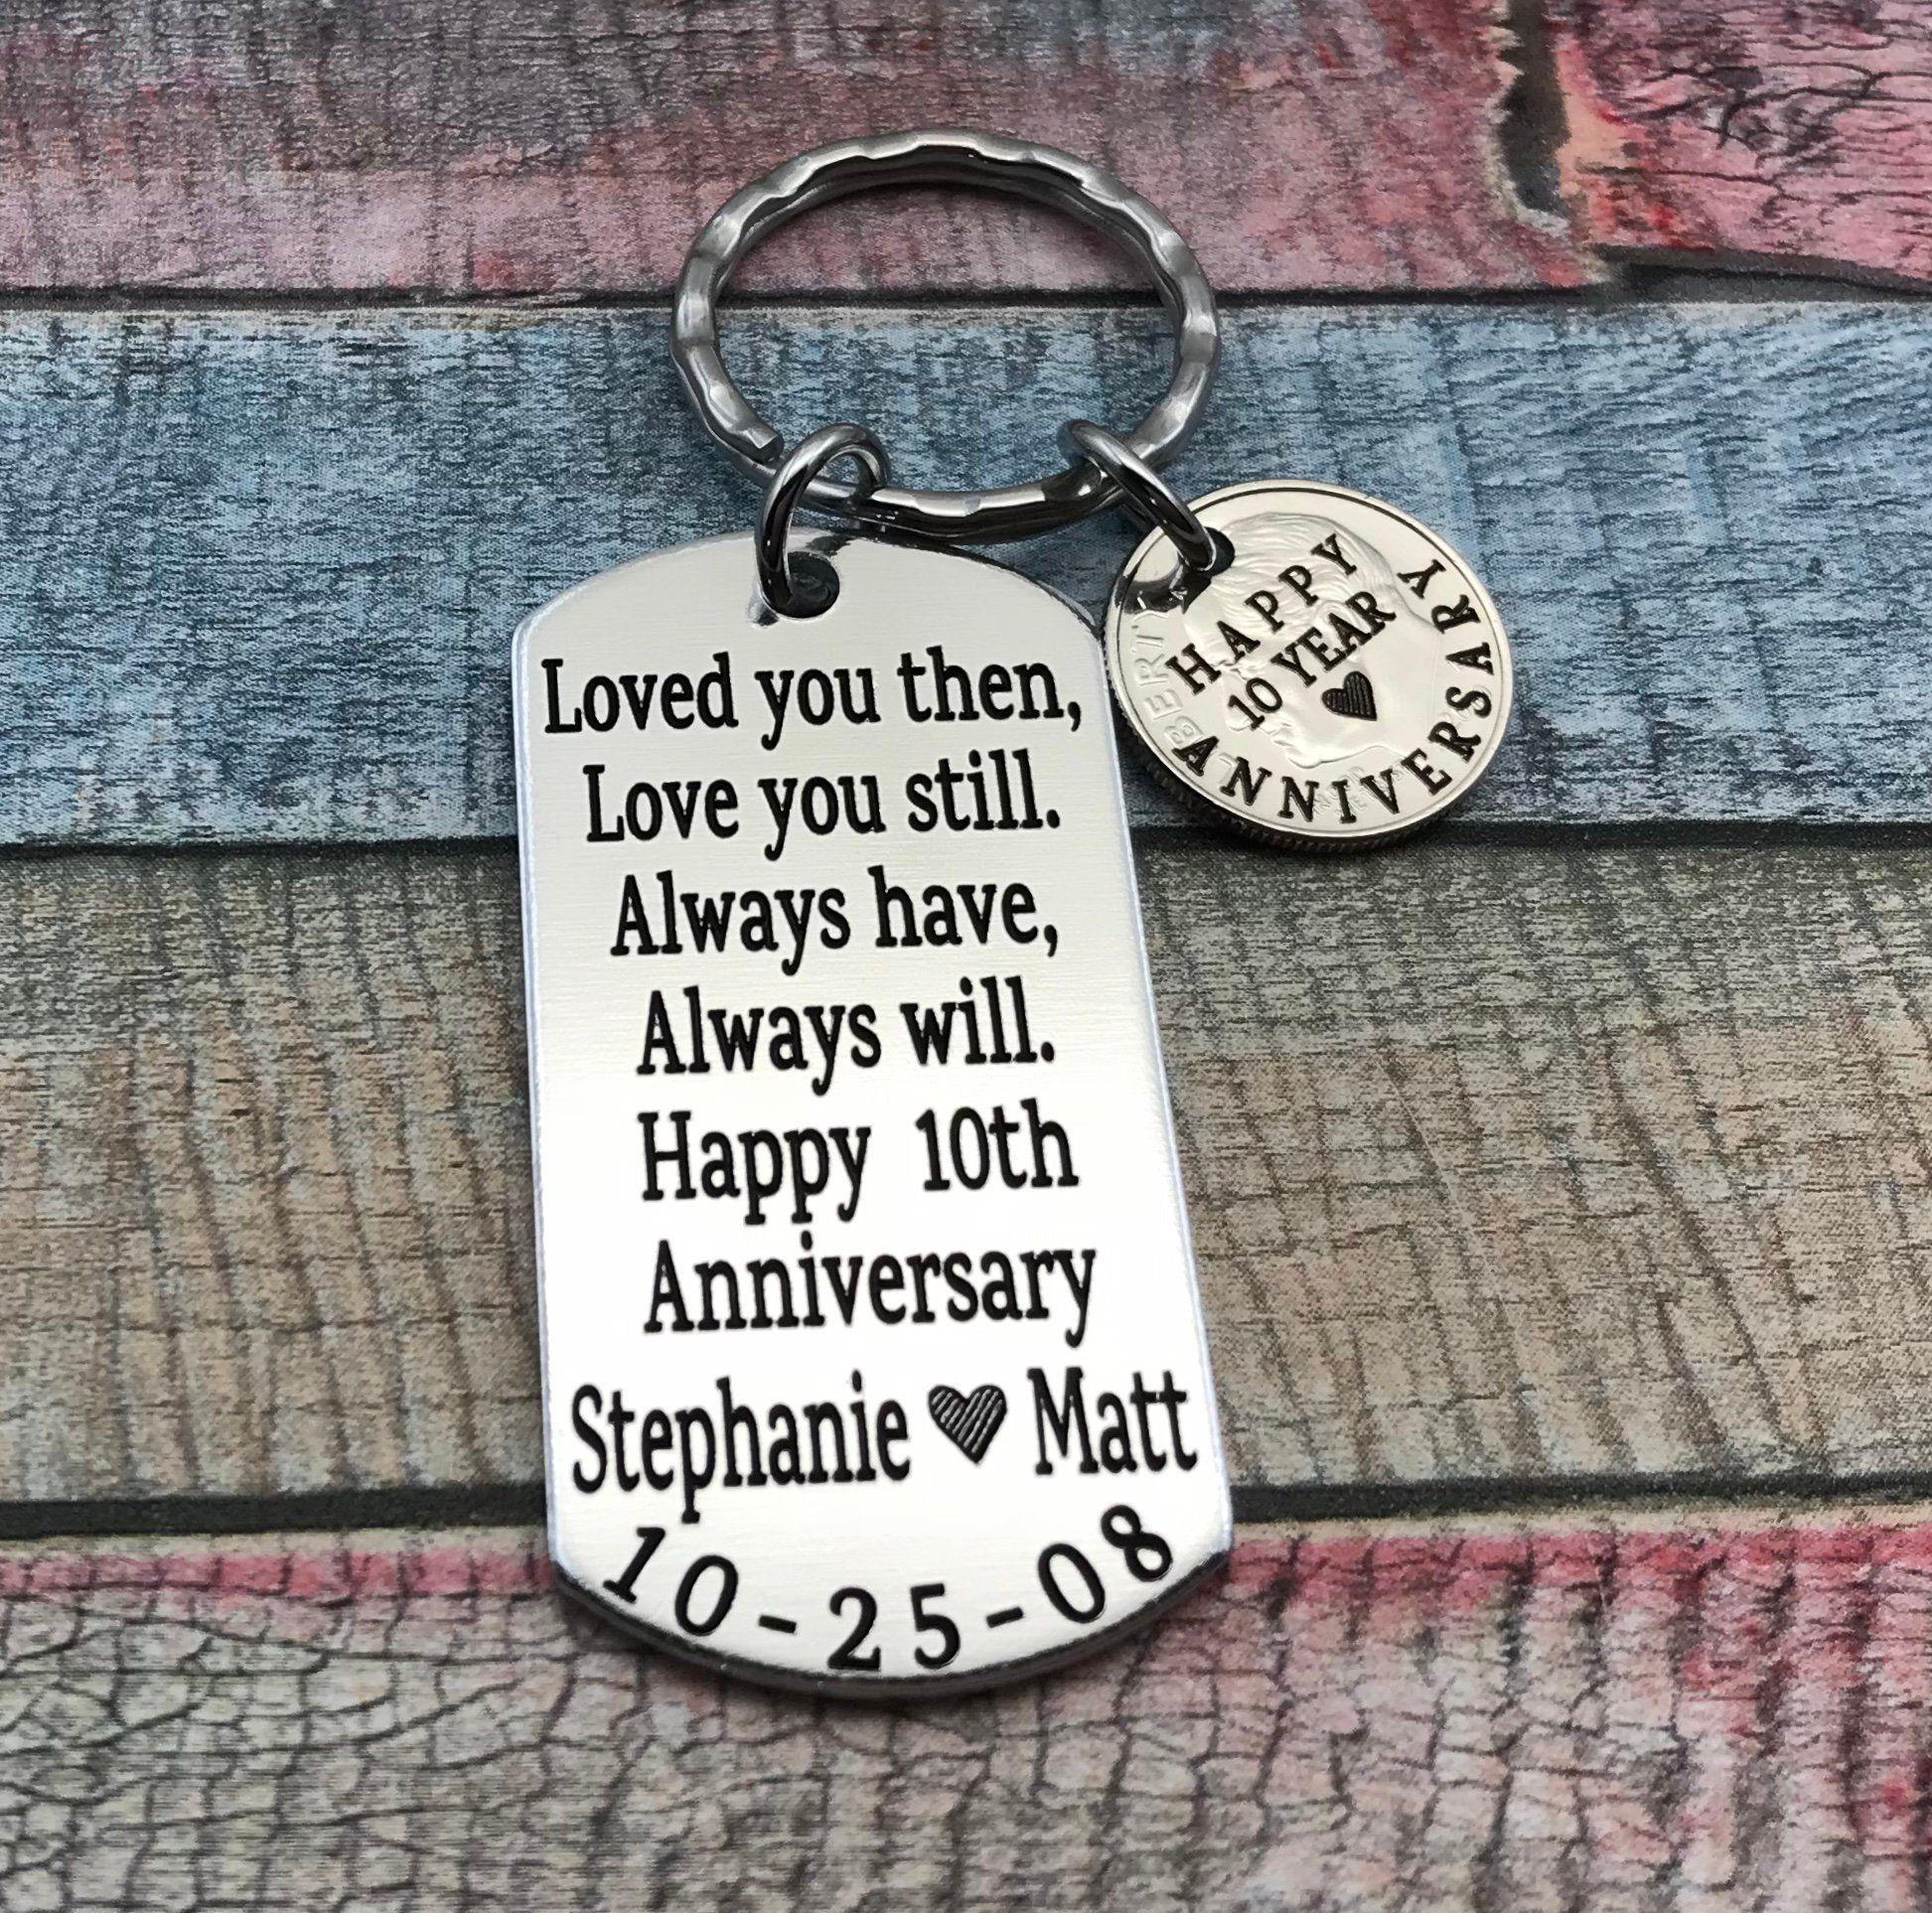 10 Year Anniversary Gift For Husband Gift For Men 10th Wedding Anniv In 2020 10 Year Anniversary Gift Anniversary Gifts For Husband 10 Year Wedding Anniversary Gift